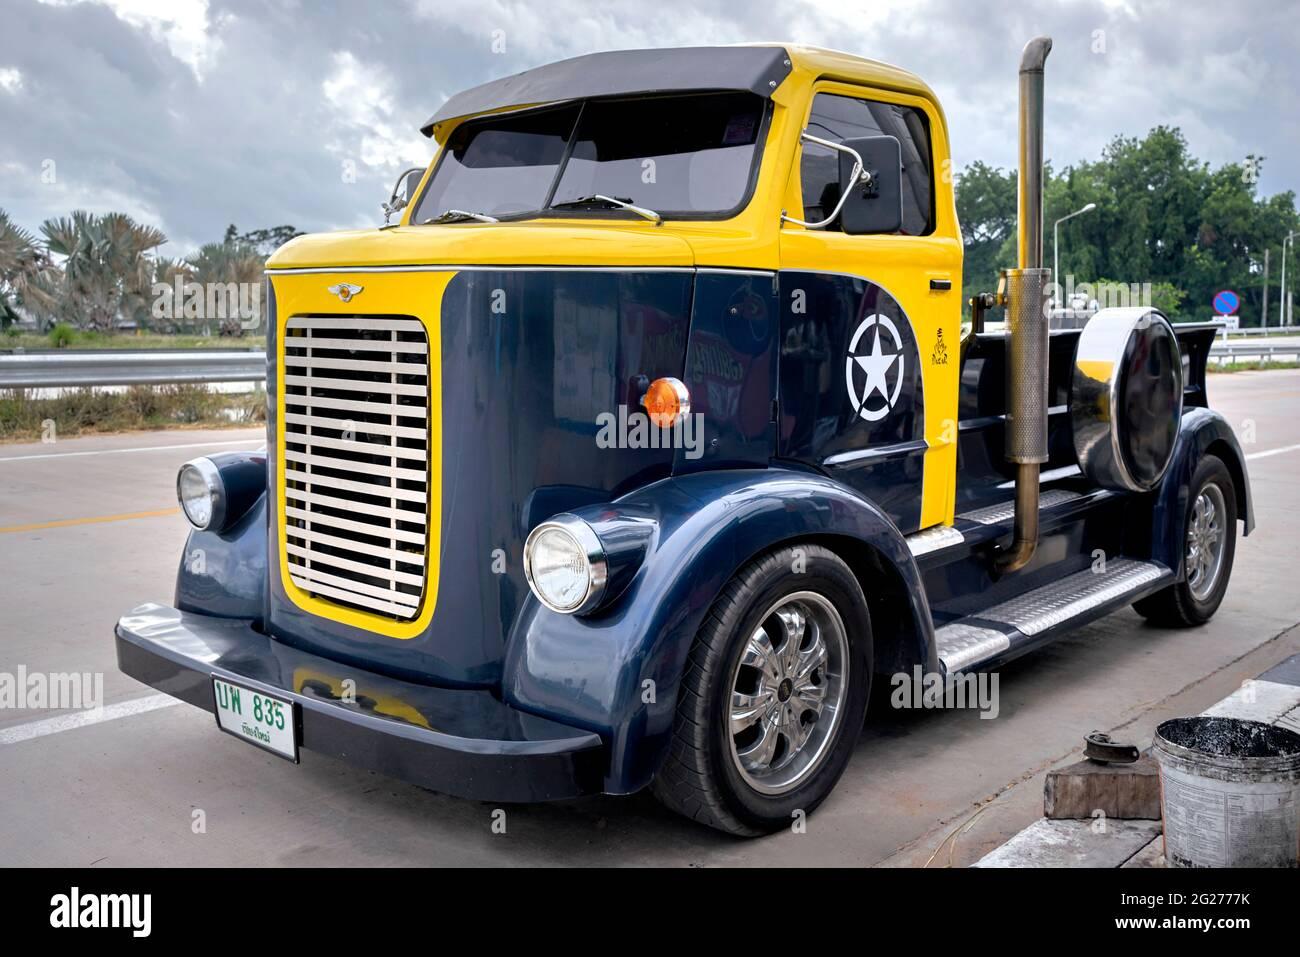 truck-pickup-american-2G2777K.jpg